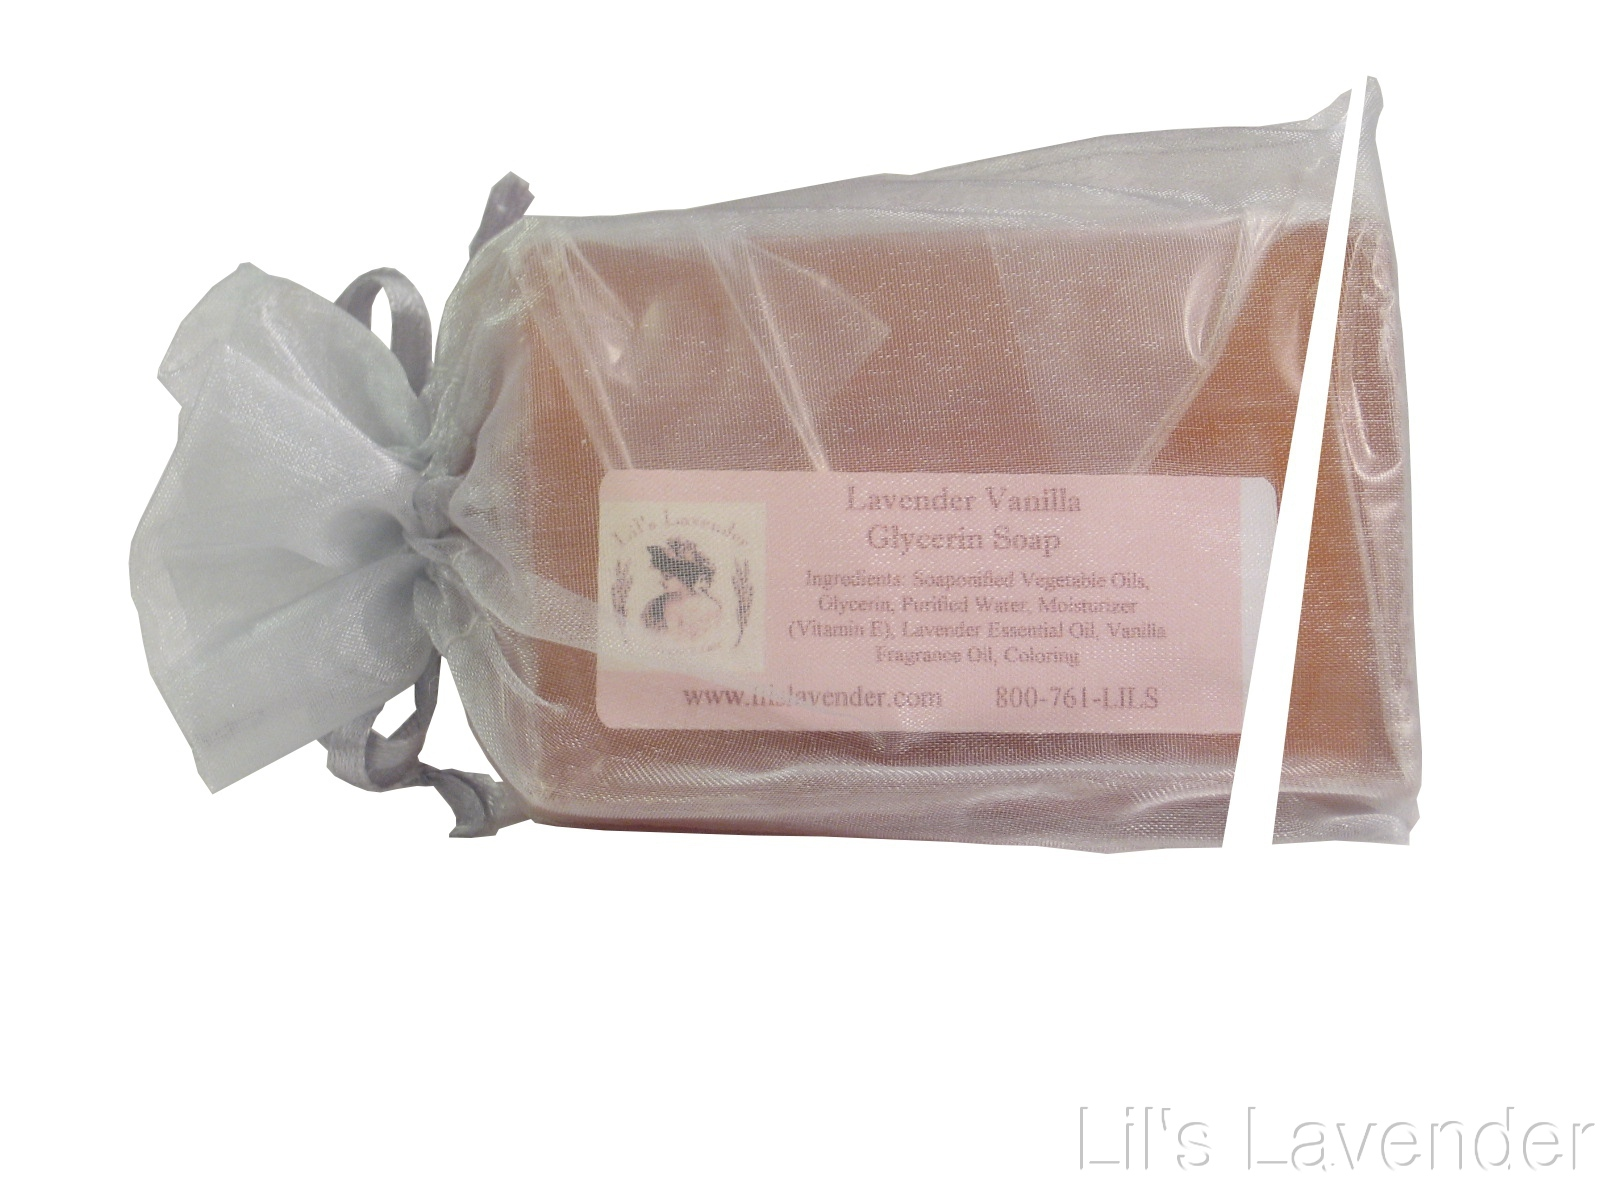 Lavender-Vanilla Glycerin Hand & Body Soap